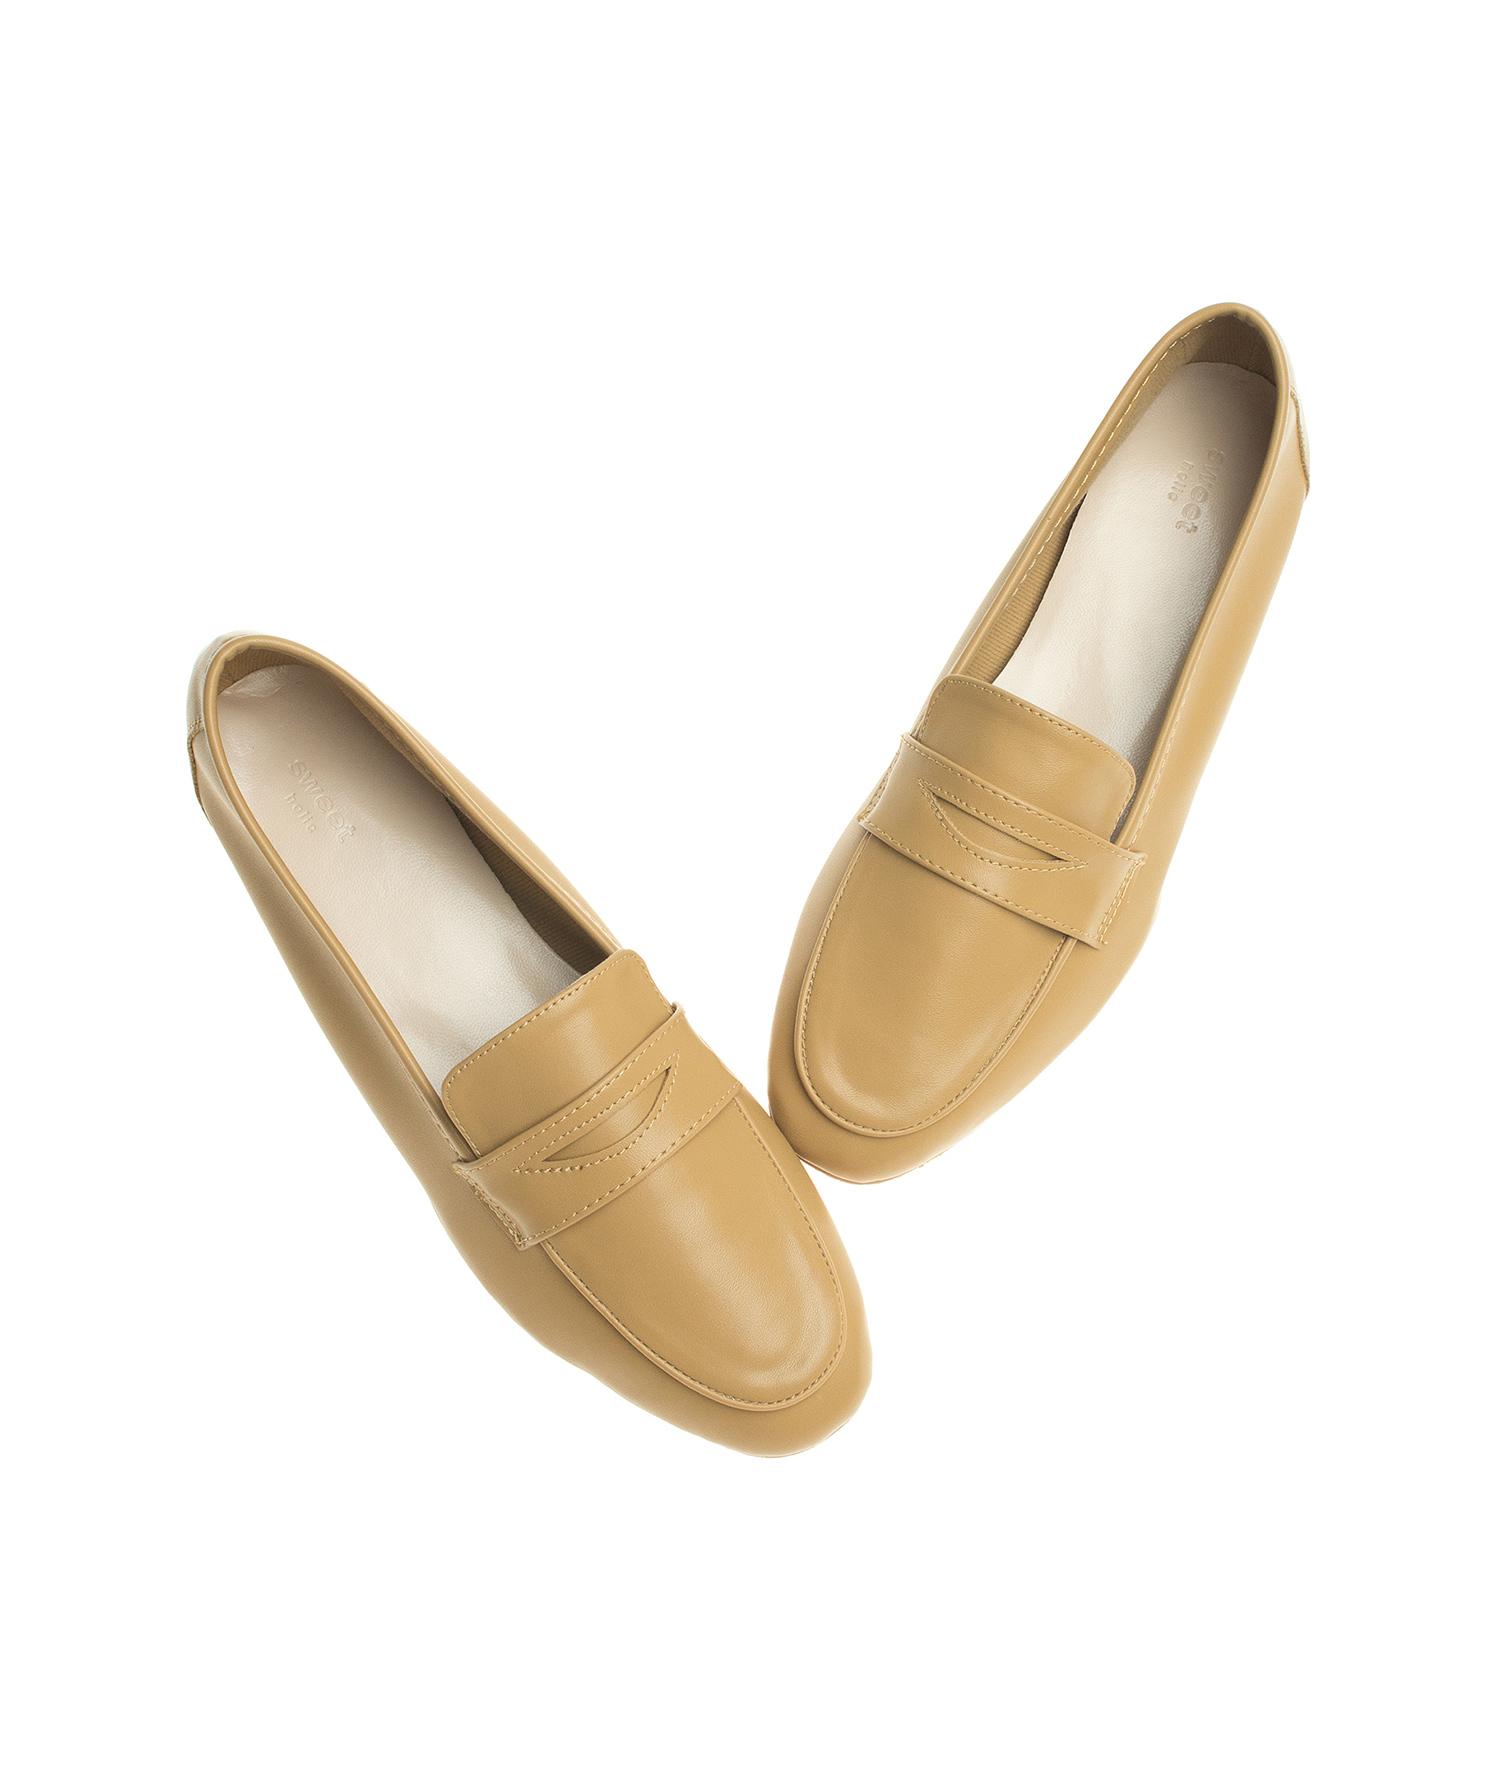 d8f23a58028 Malva Vegan Leather Penny Loafers - annakastleshoes.com